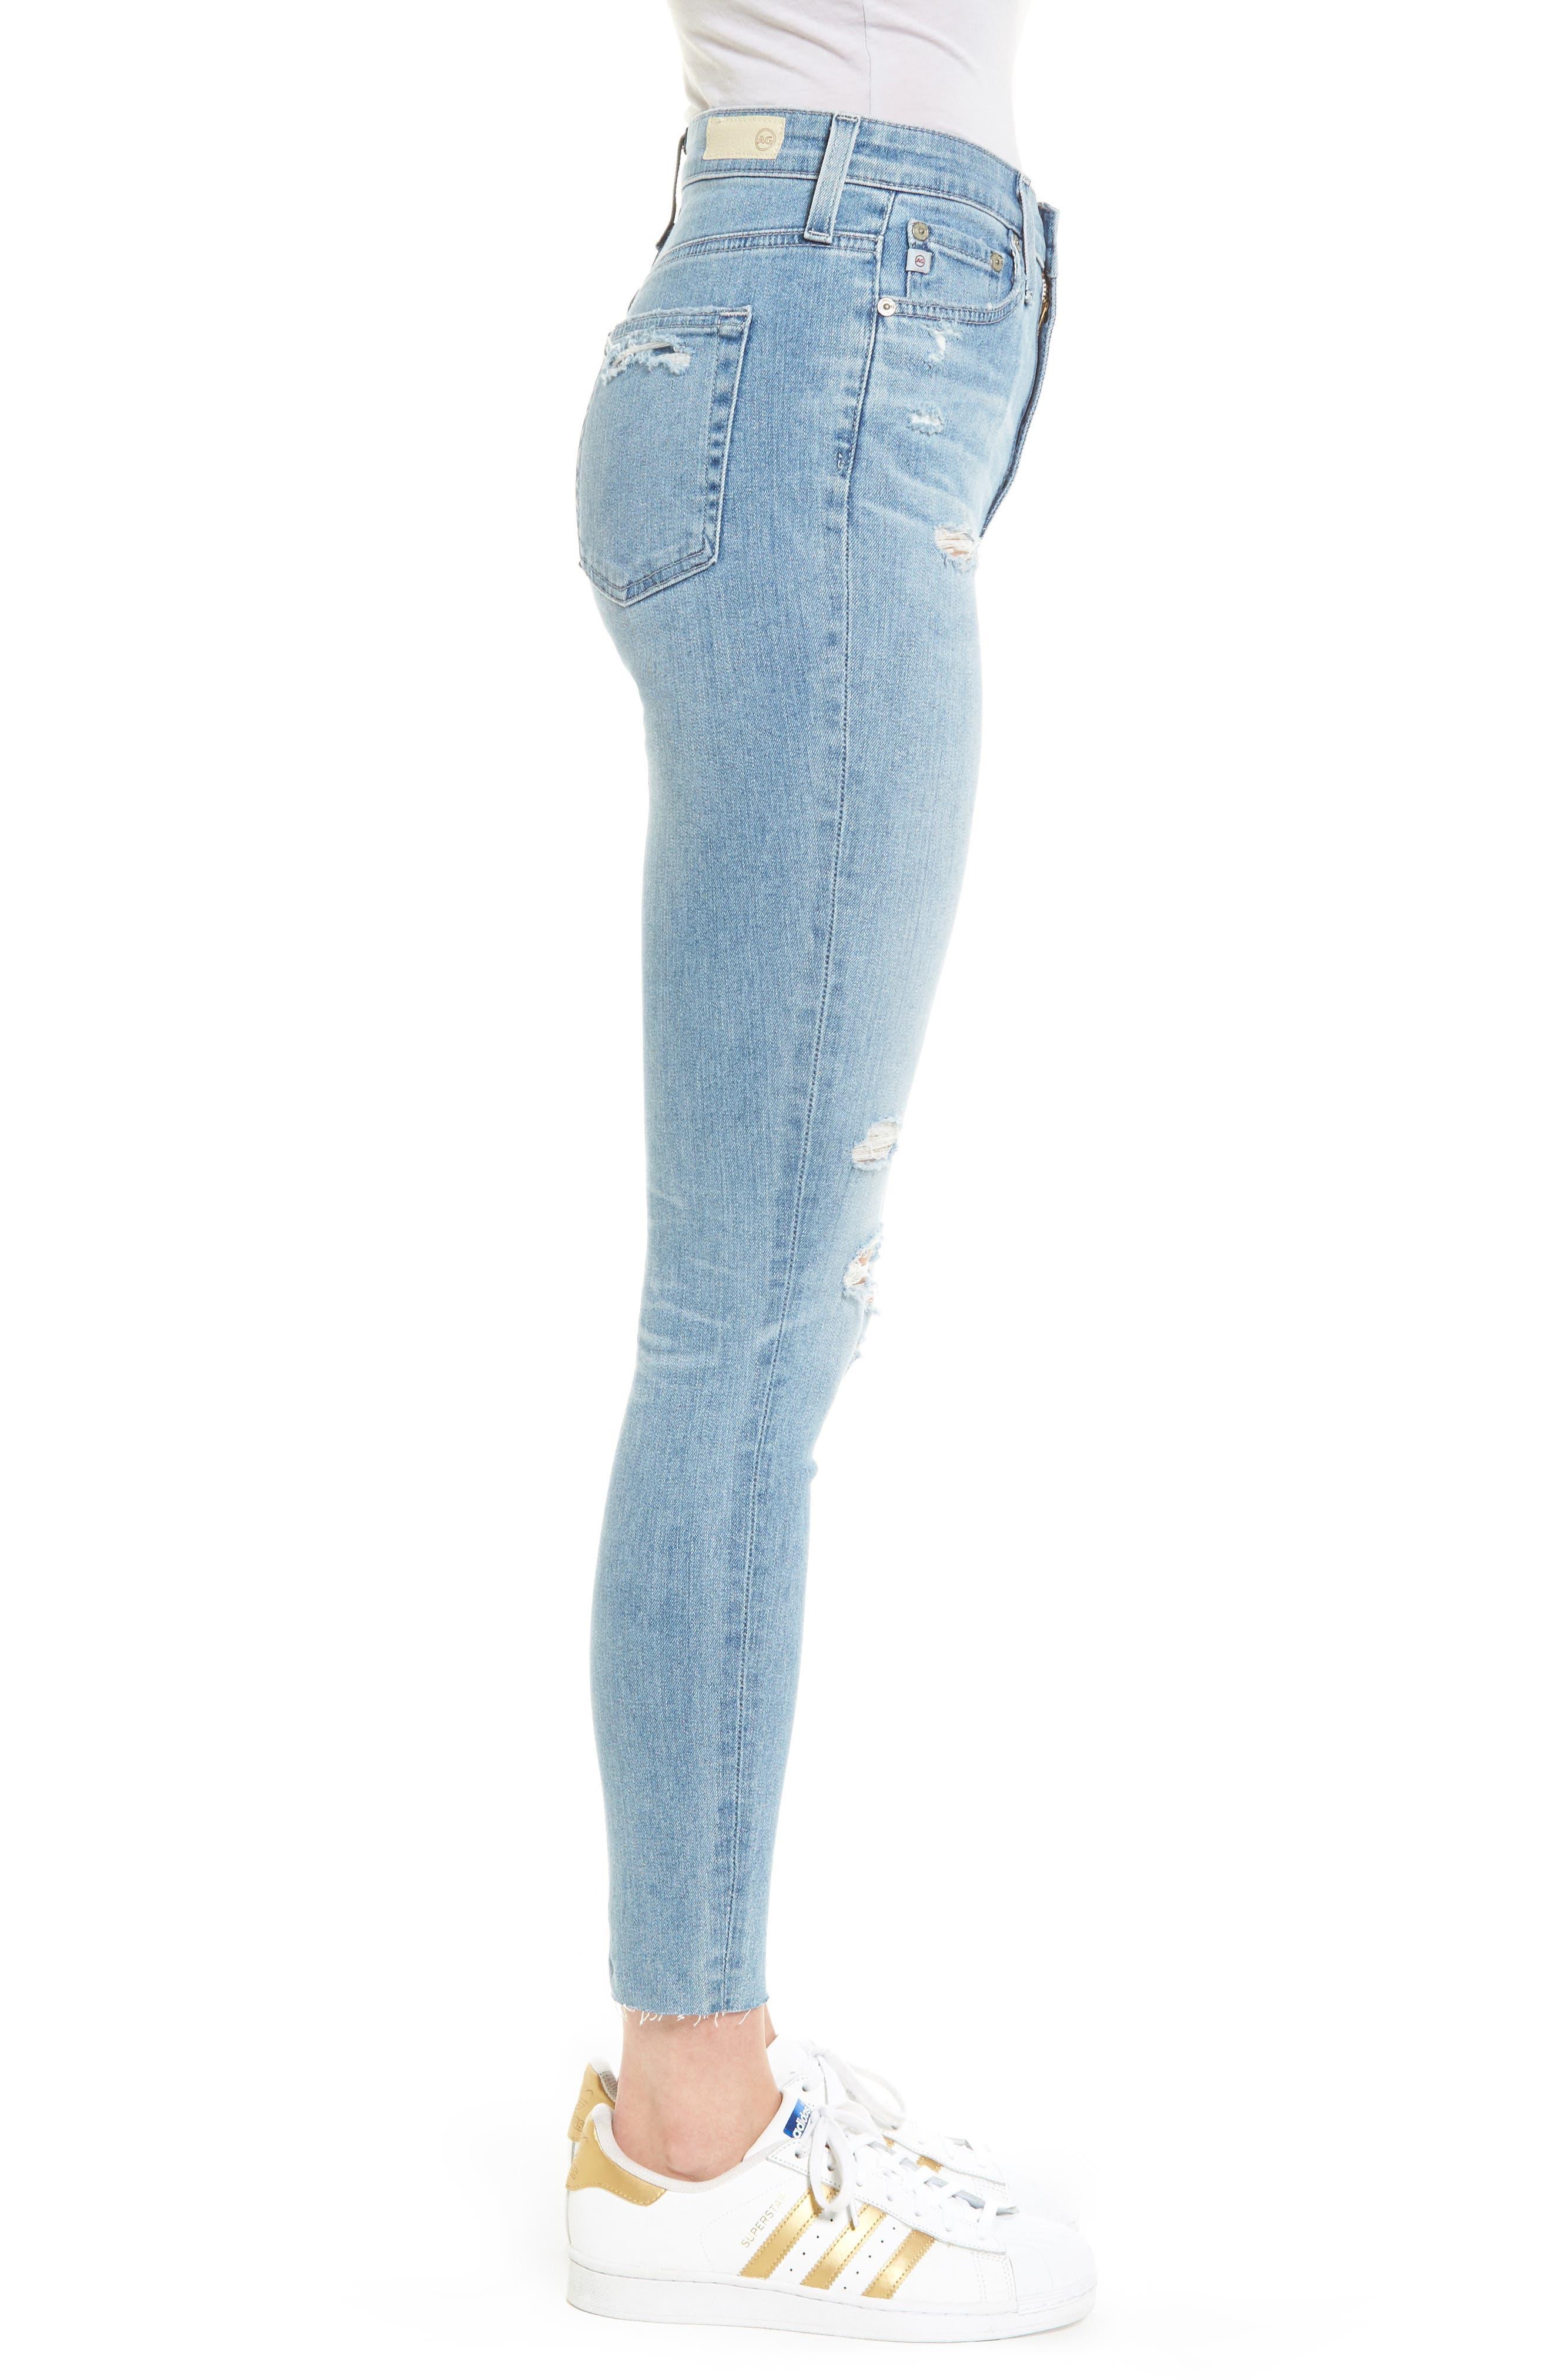 Mila High Waist Ankle Skinny Jeans,                             Alternate thumbnail 3, color,                             20 Years-Oceana Destructed